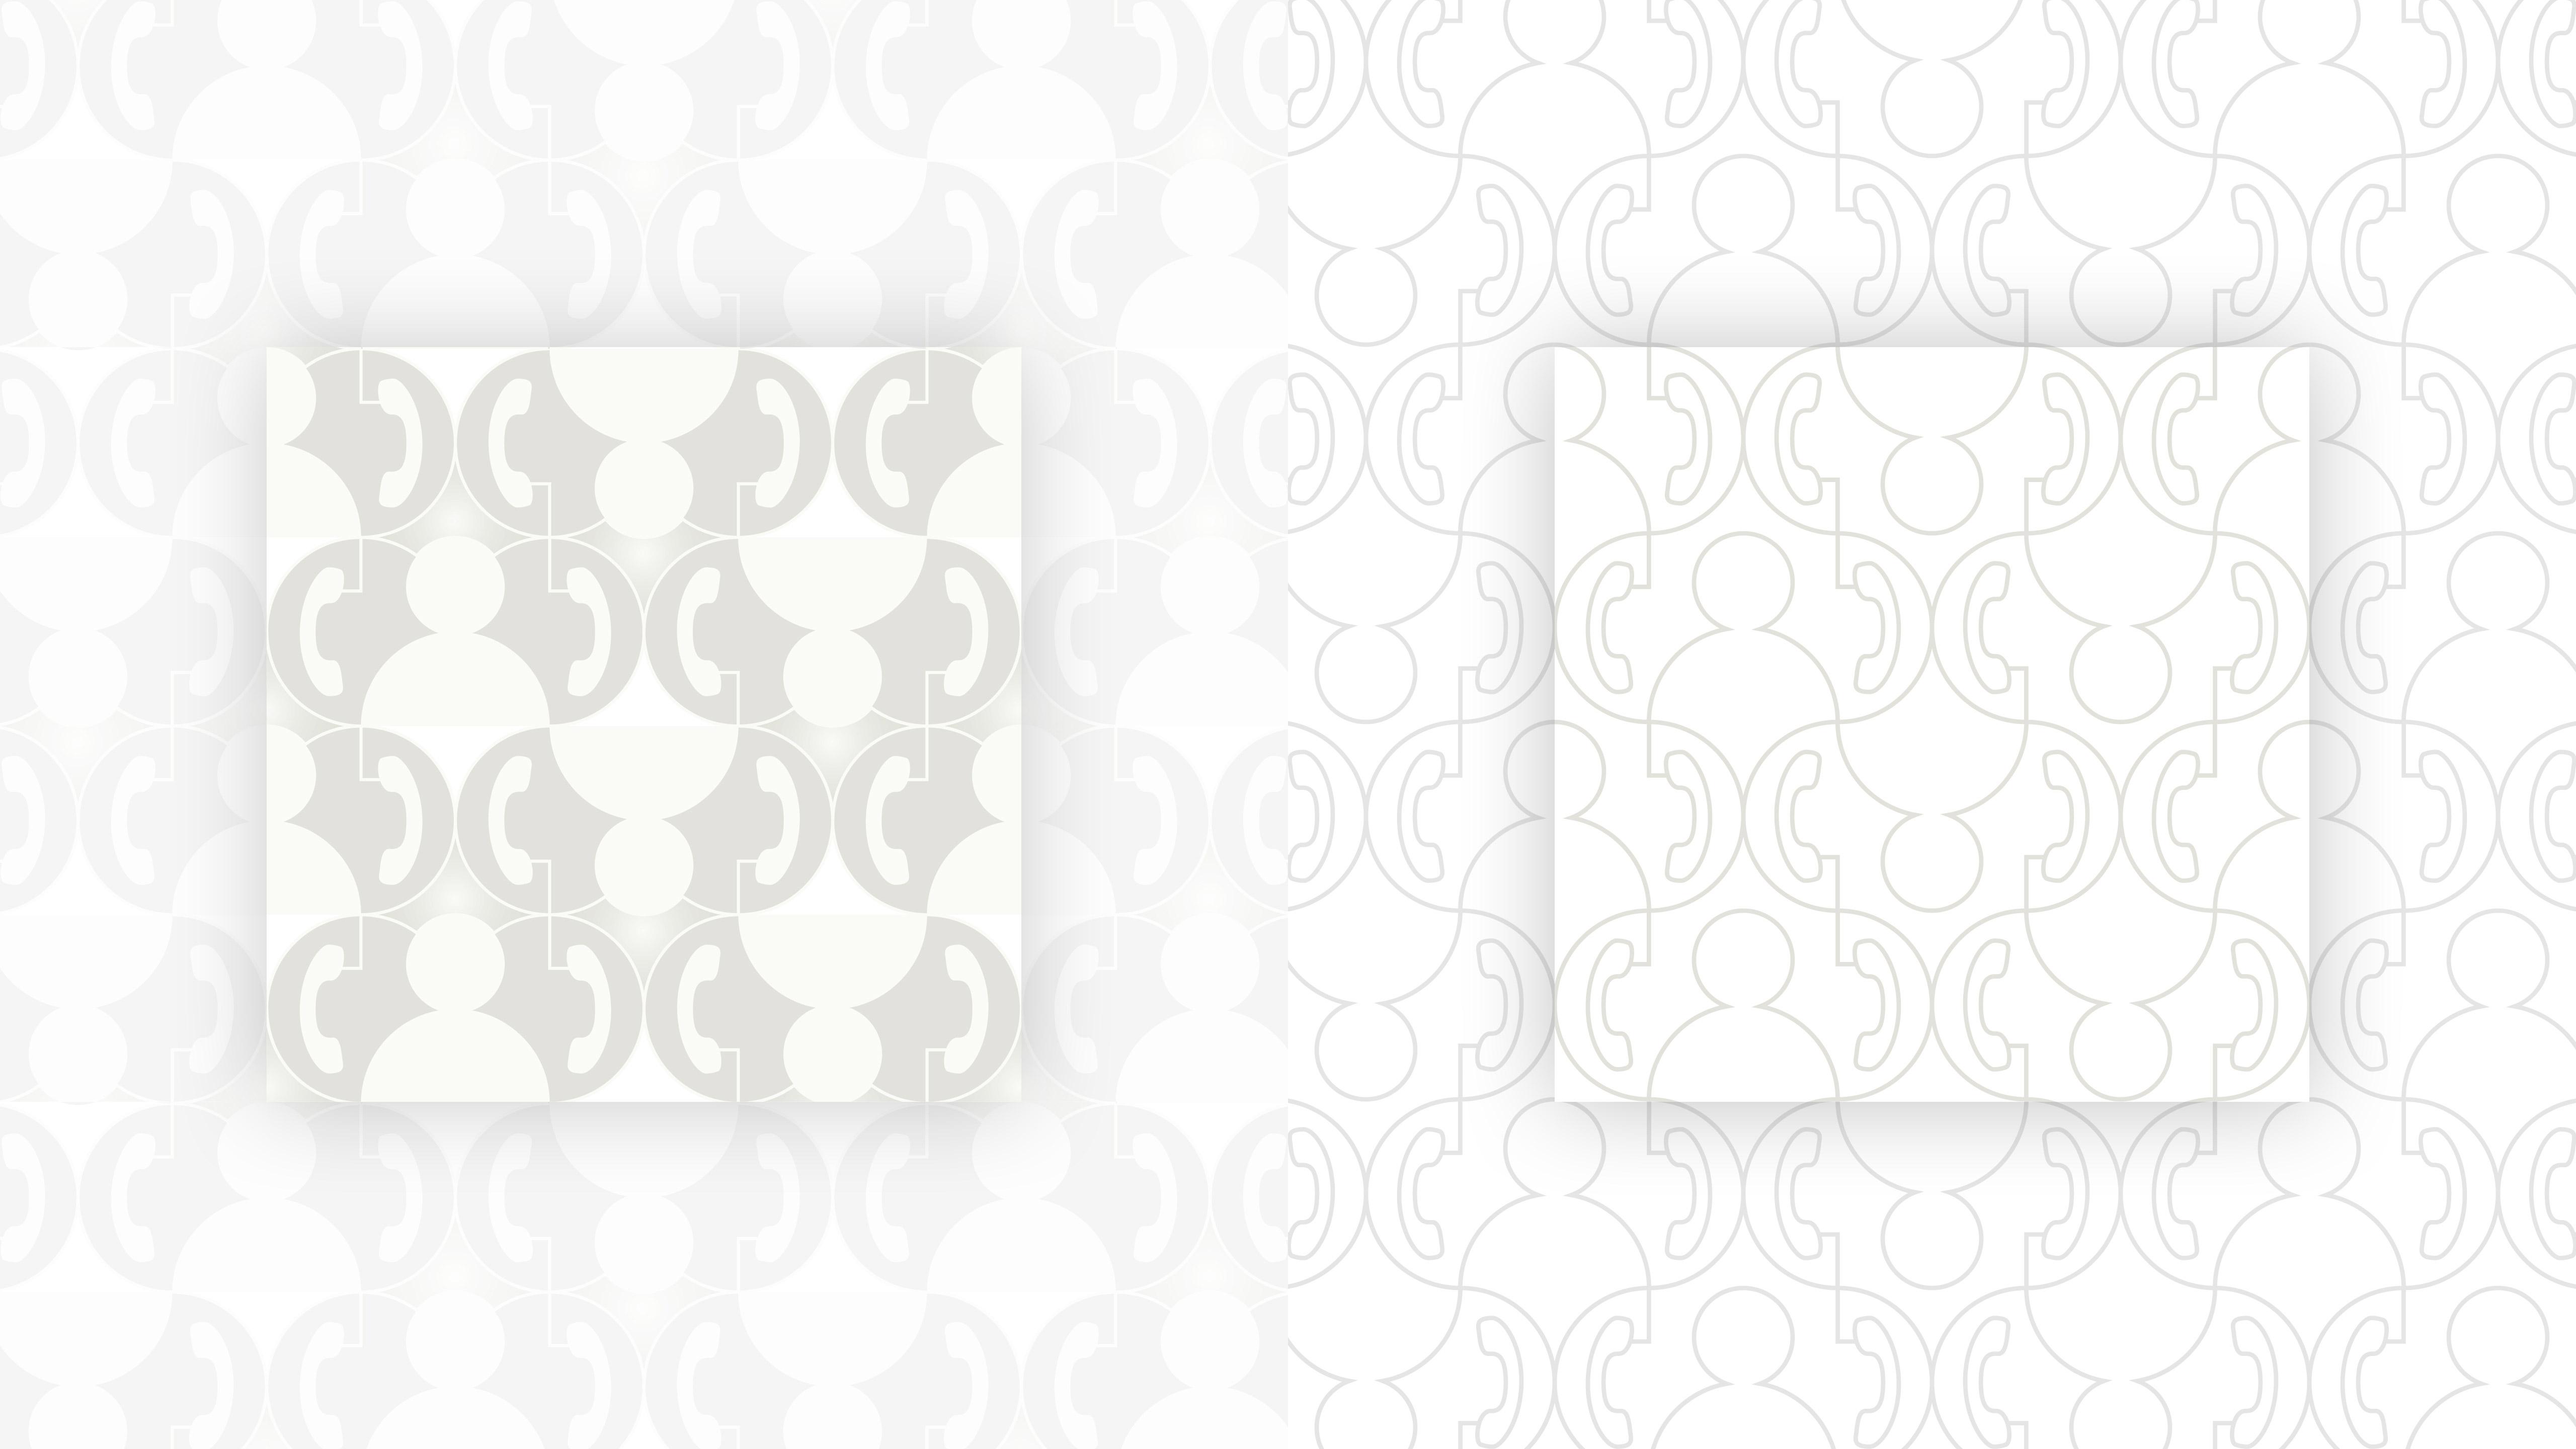 etisalat_design_system_013